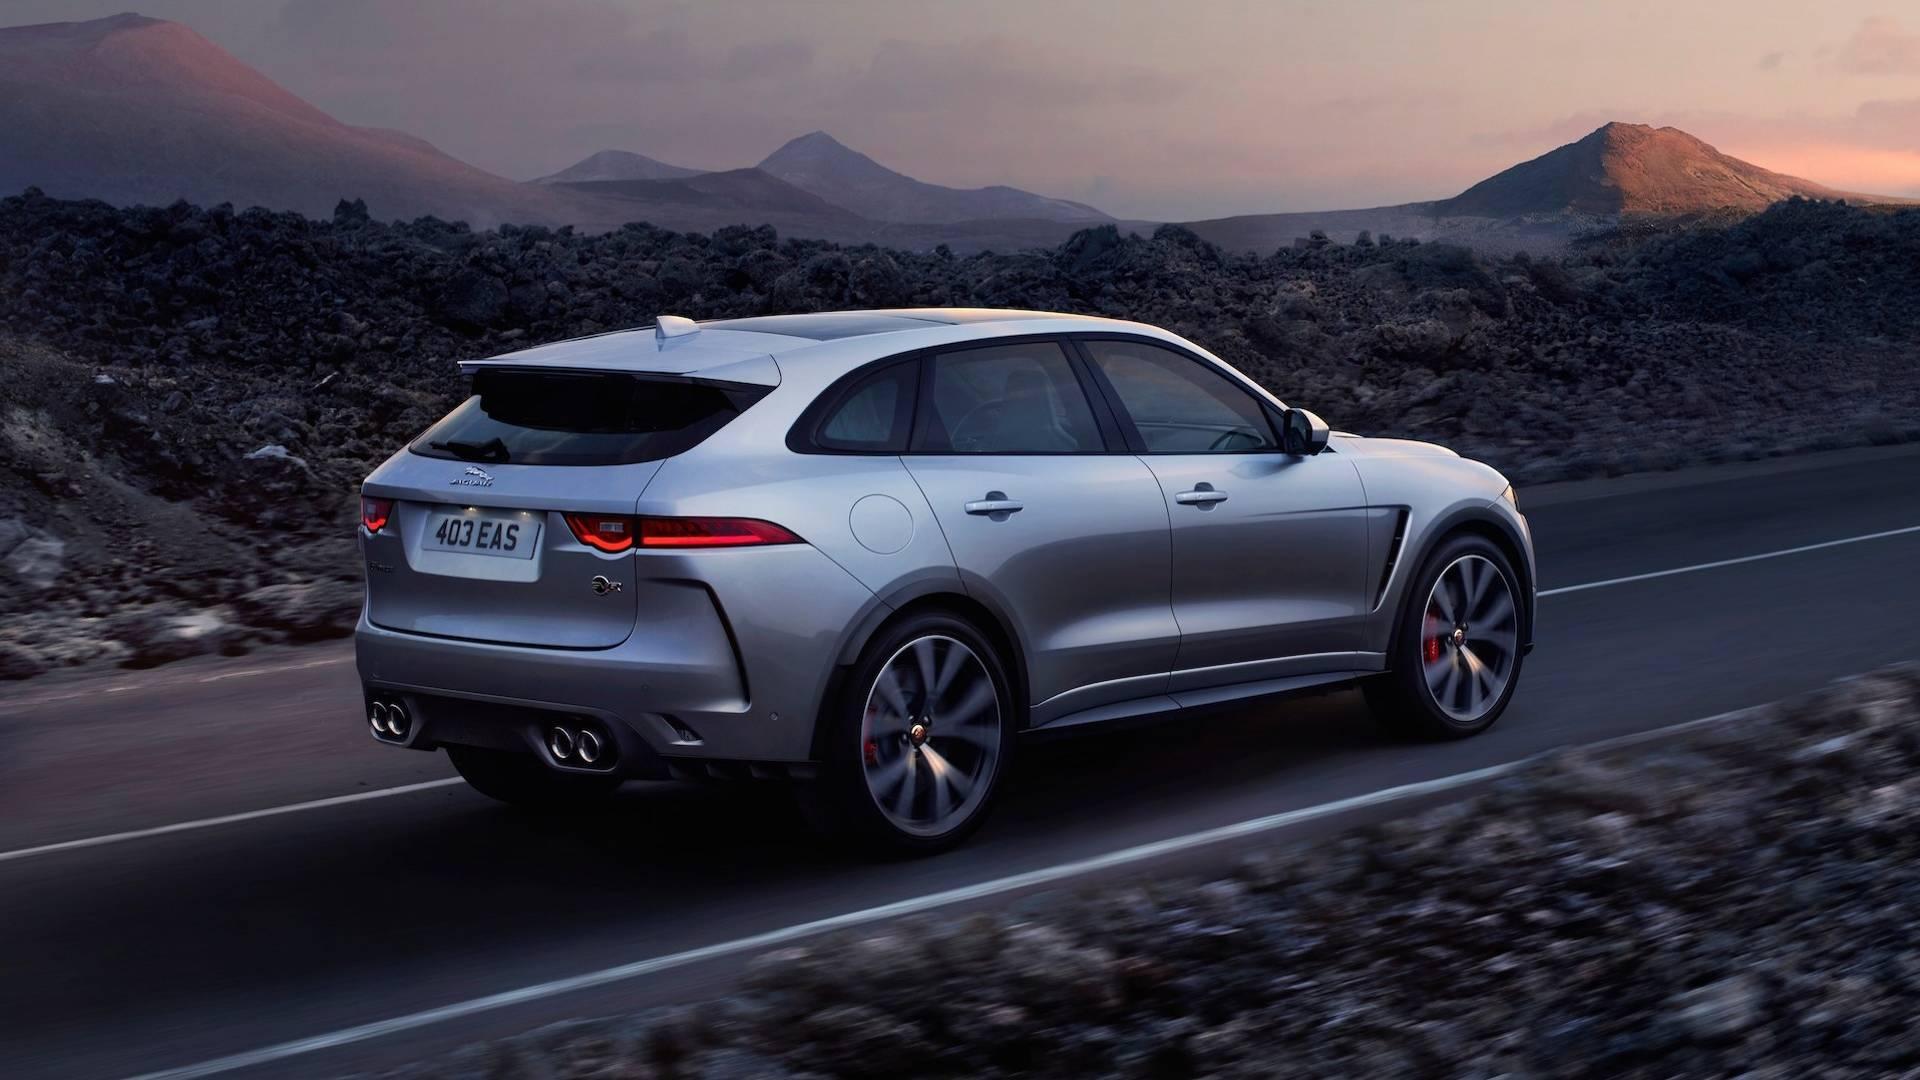 J-Pace станет флагманским электромобилем Jaguar 4